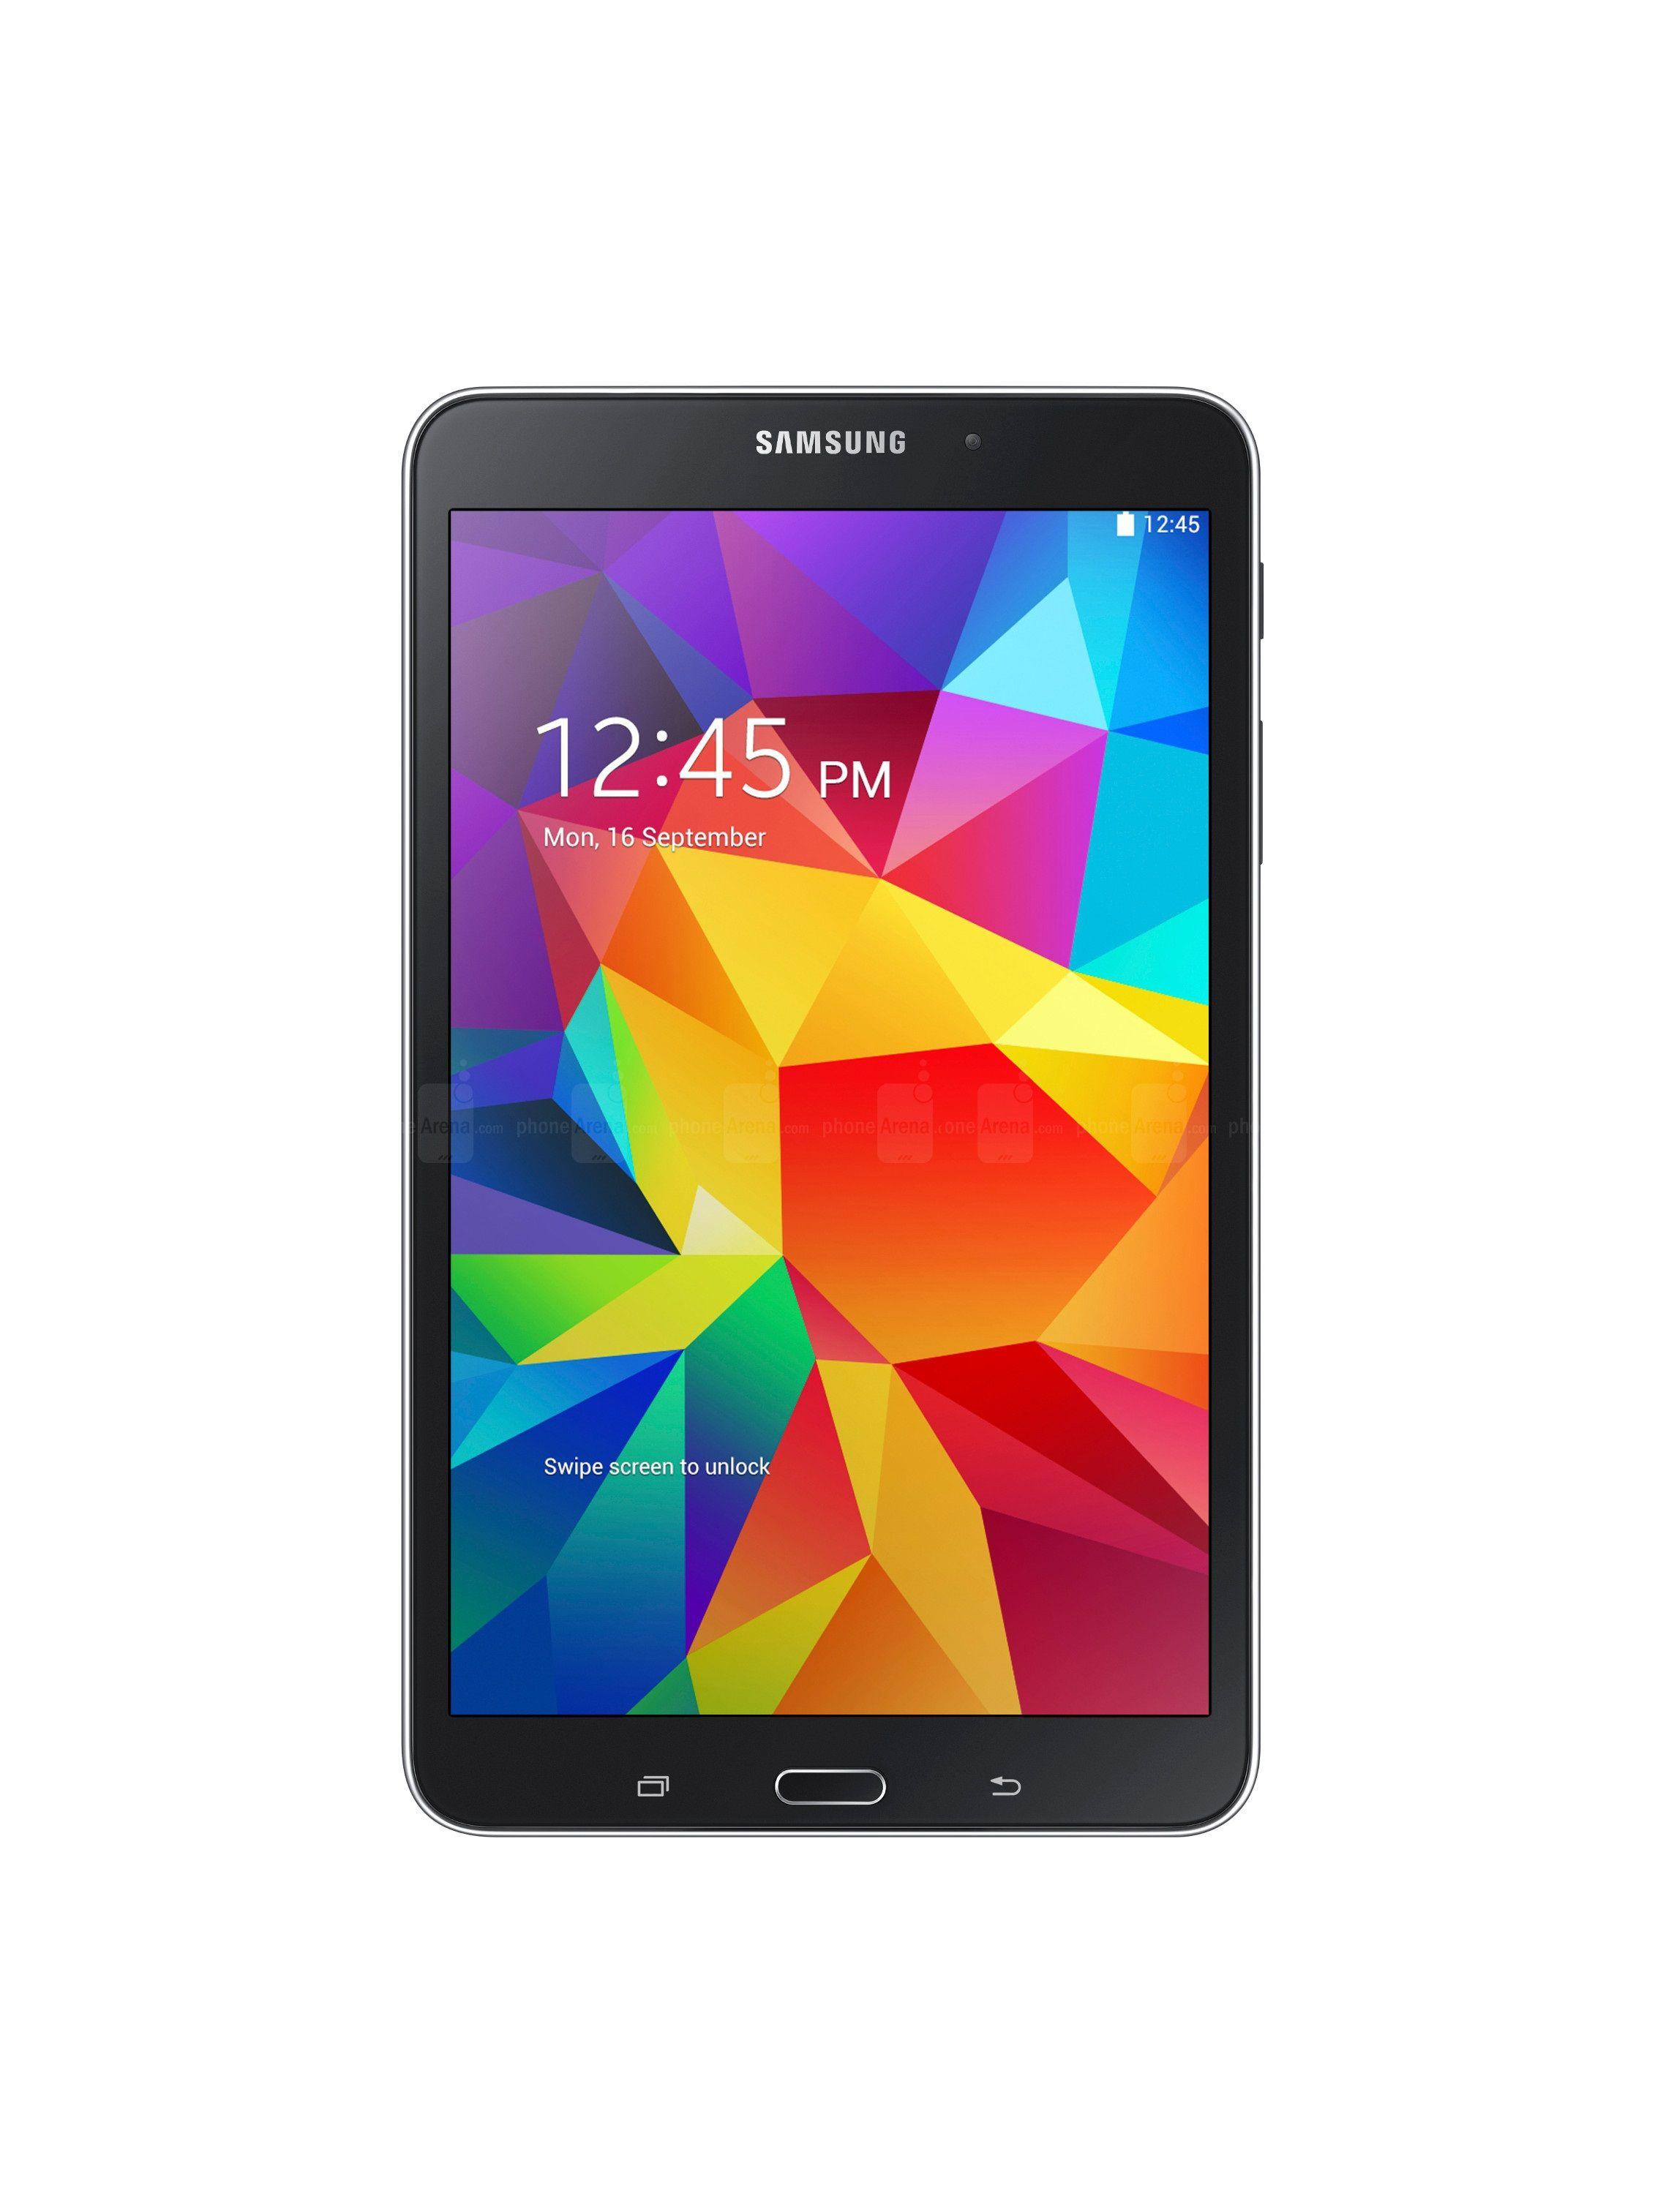 Samsung Galaxy Tab 4 8.0 Specs of Gadgets Samsung